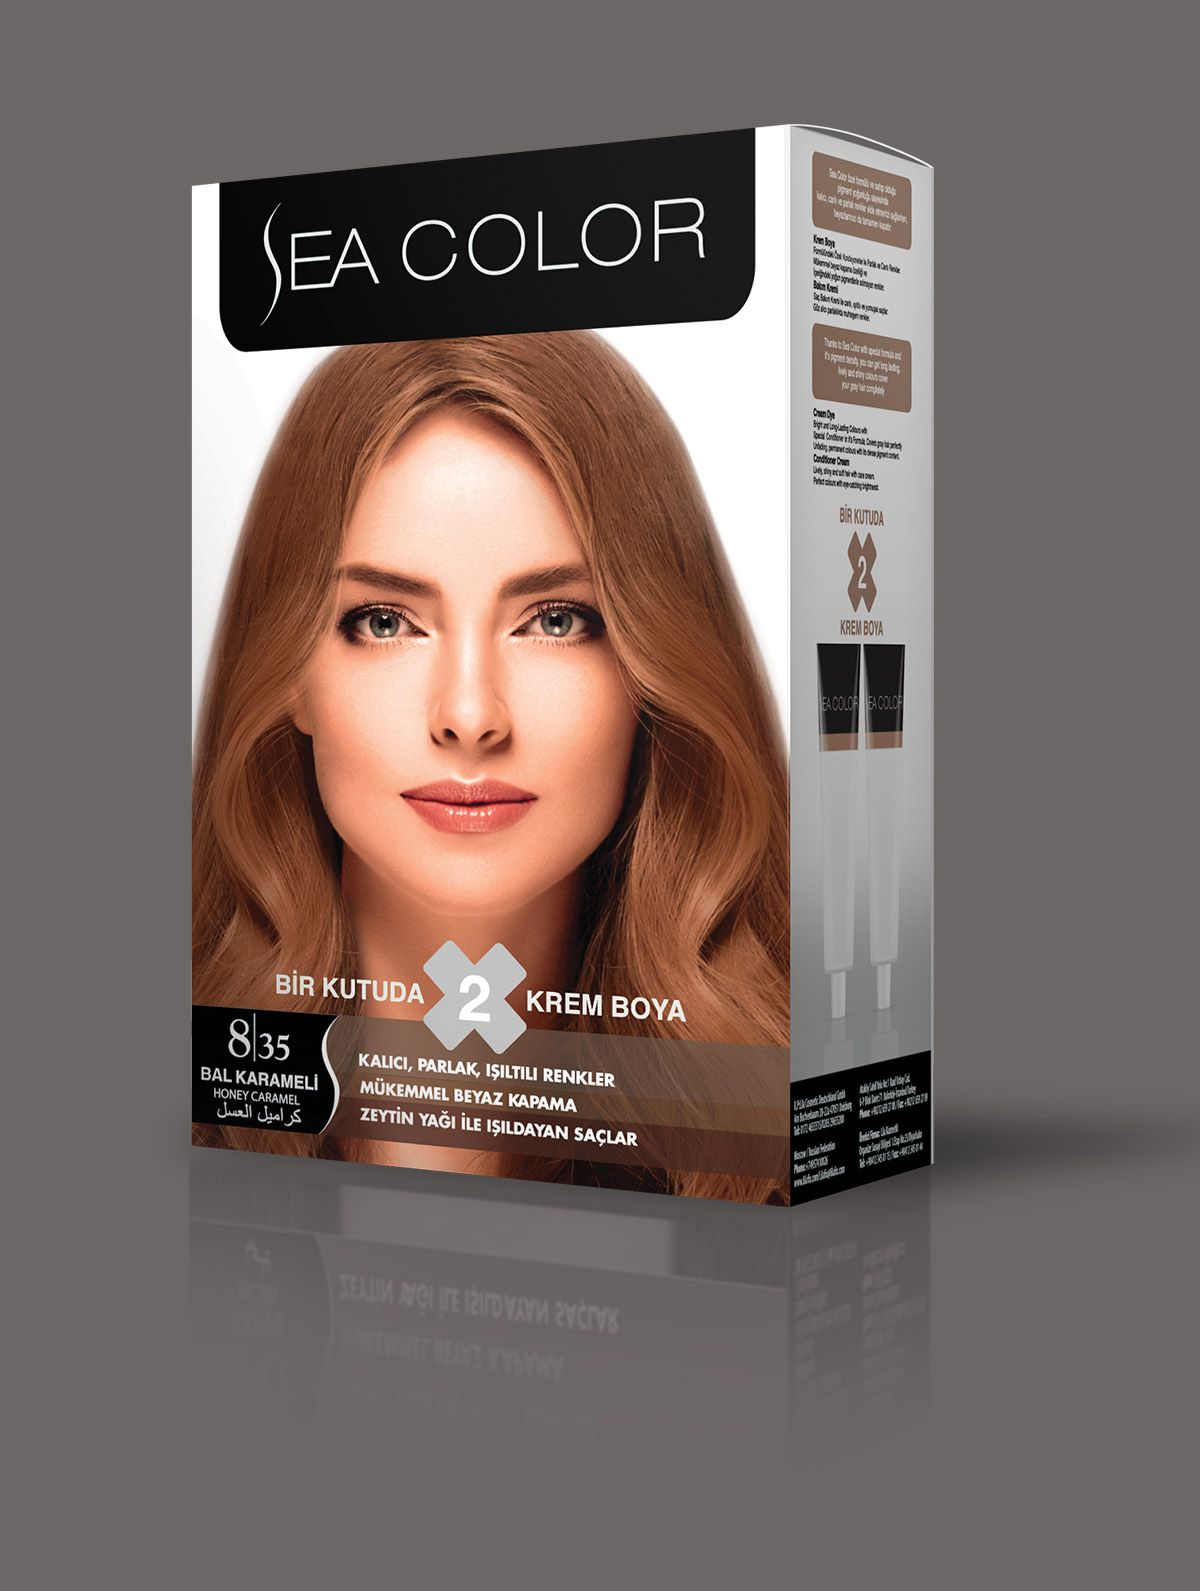 Sea Color Sac Boyasi 8 35 Bal Karameli Sac Boyasi Renkler Sac